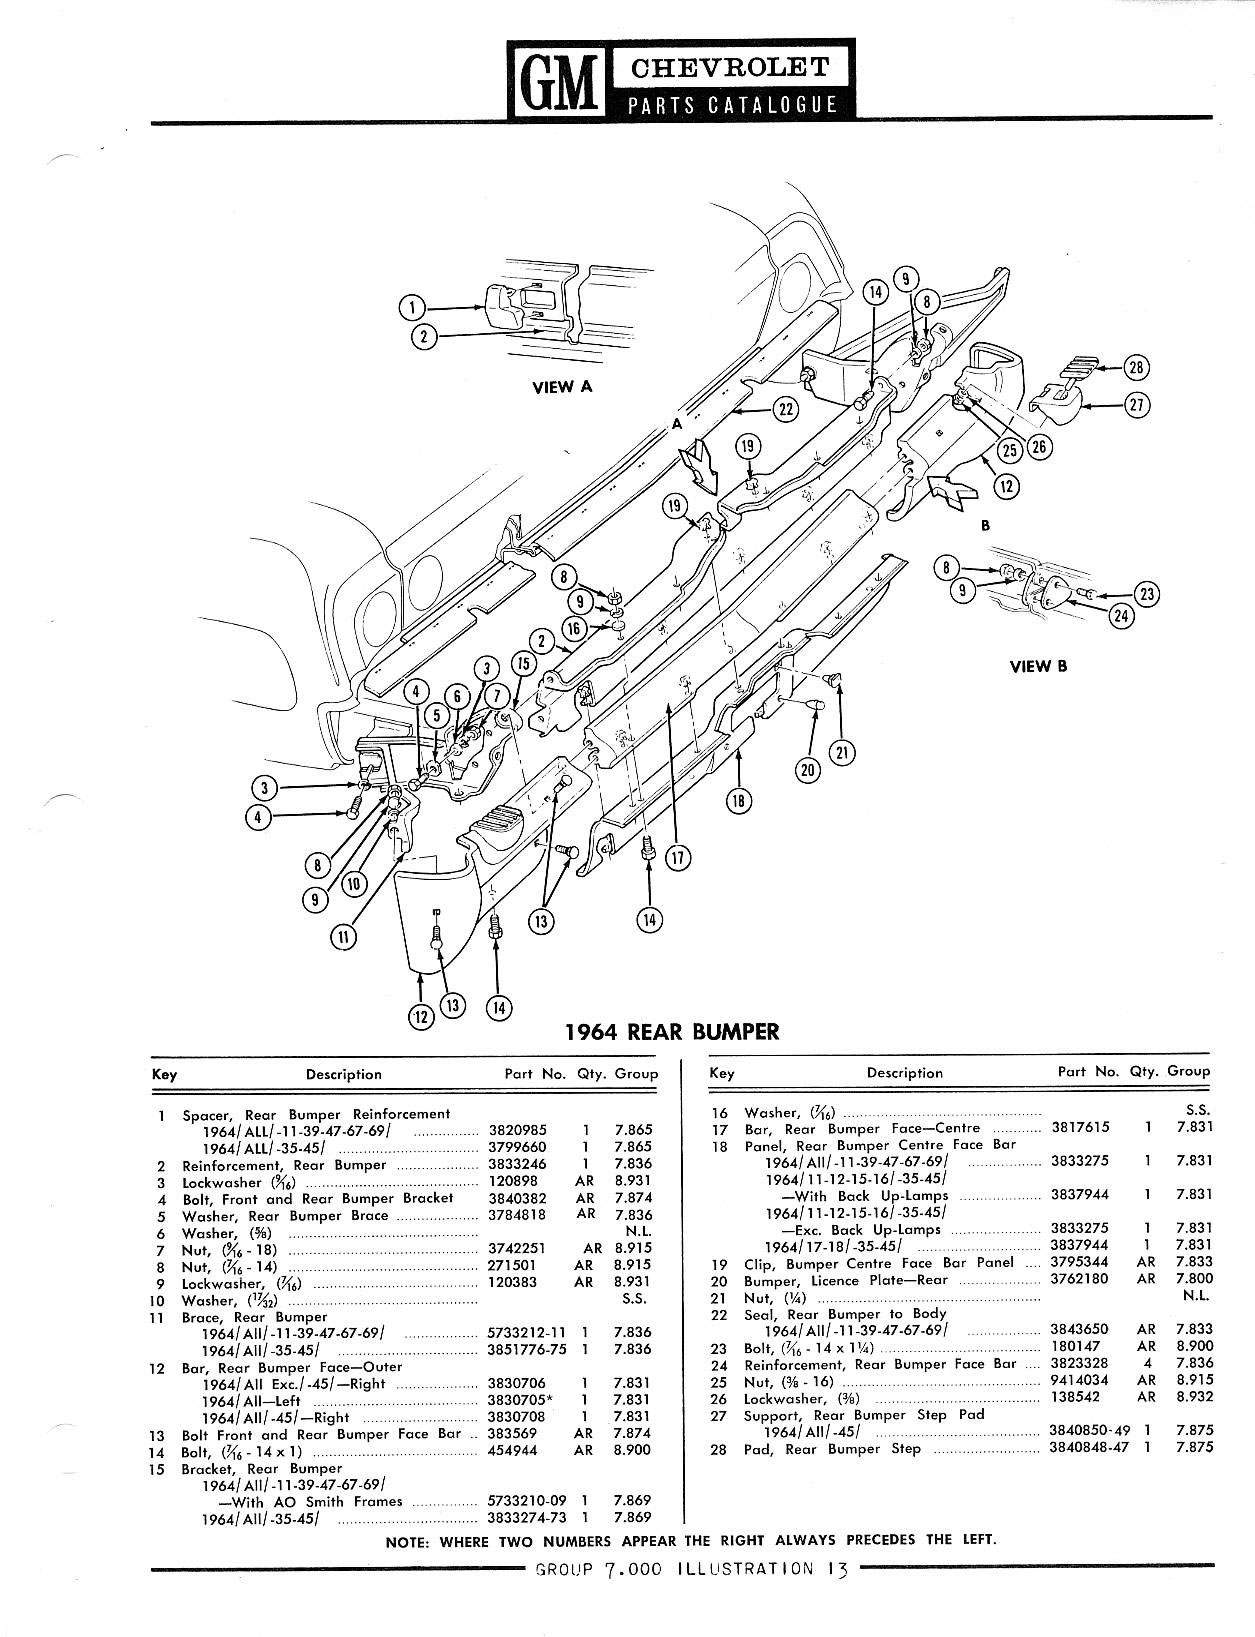 1958-1968 Chevrolet Parts Catalog / Image61.jpg